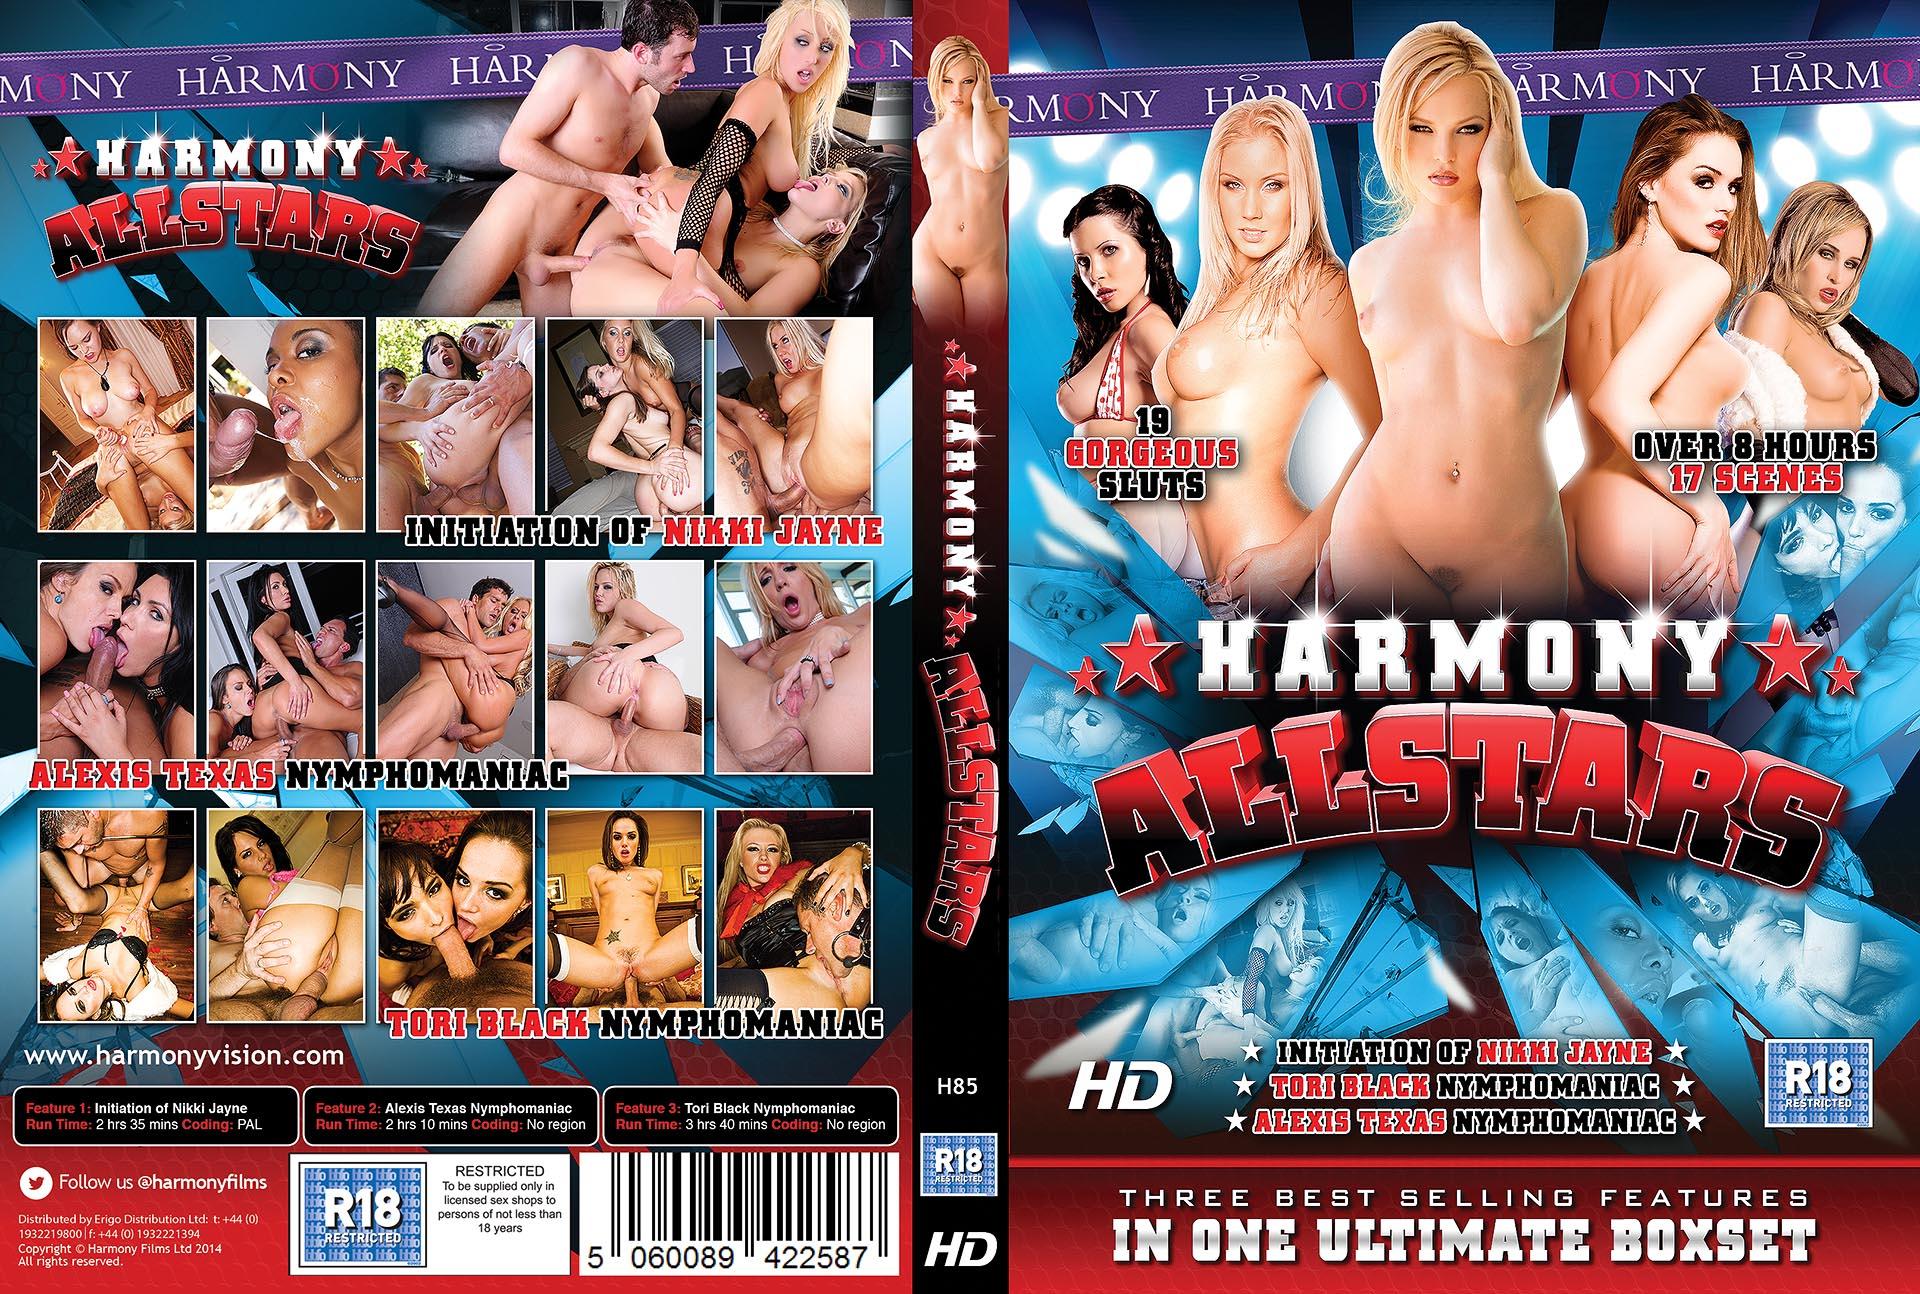 HarmonyAllstars_sleeve_uk_large.jpg